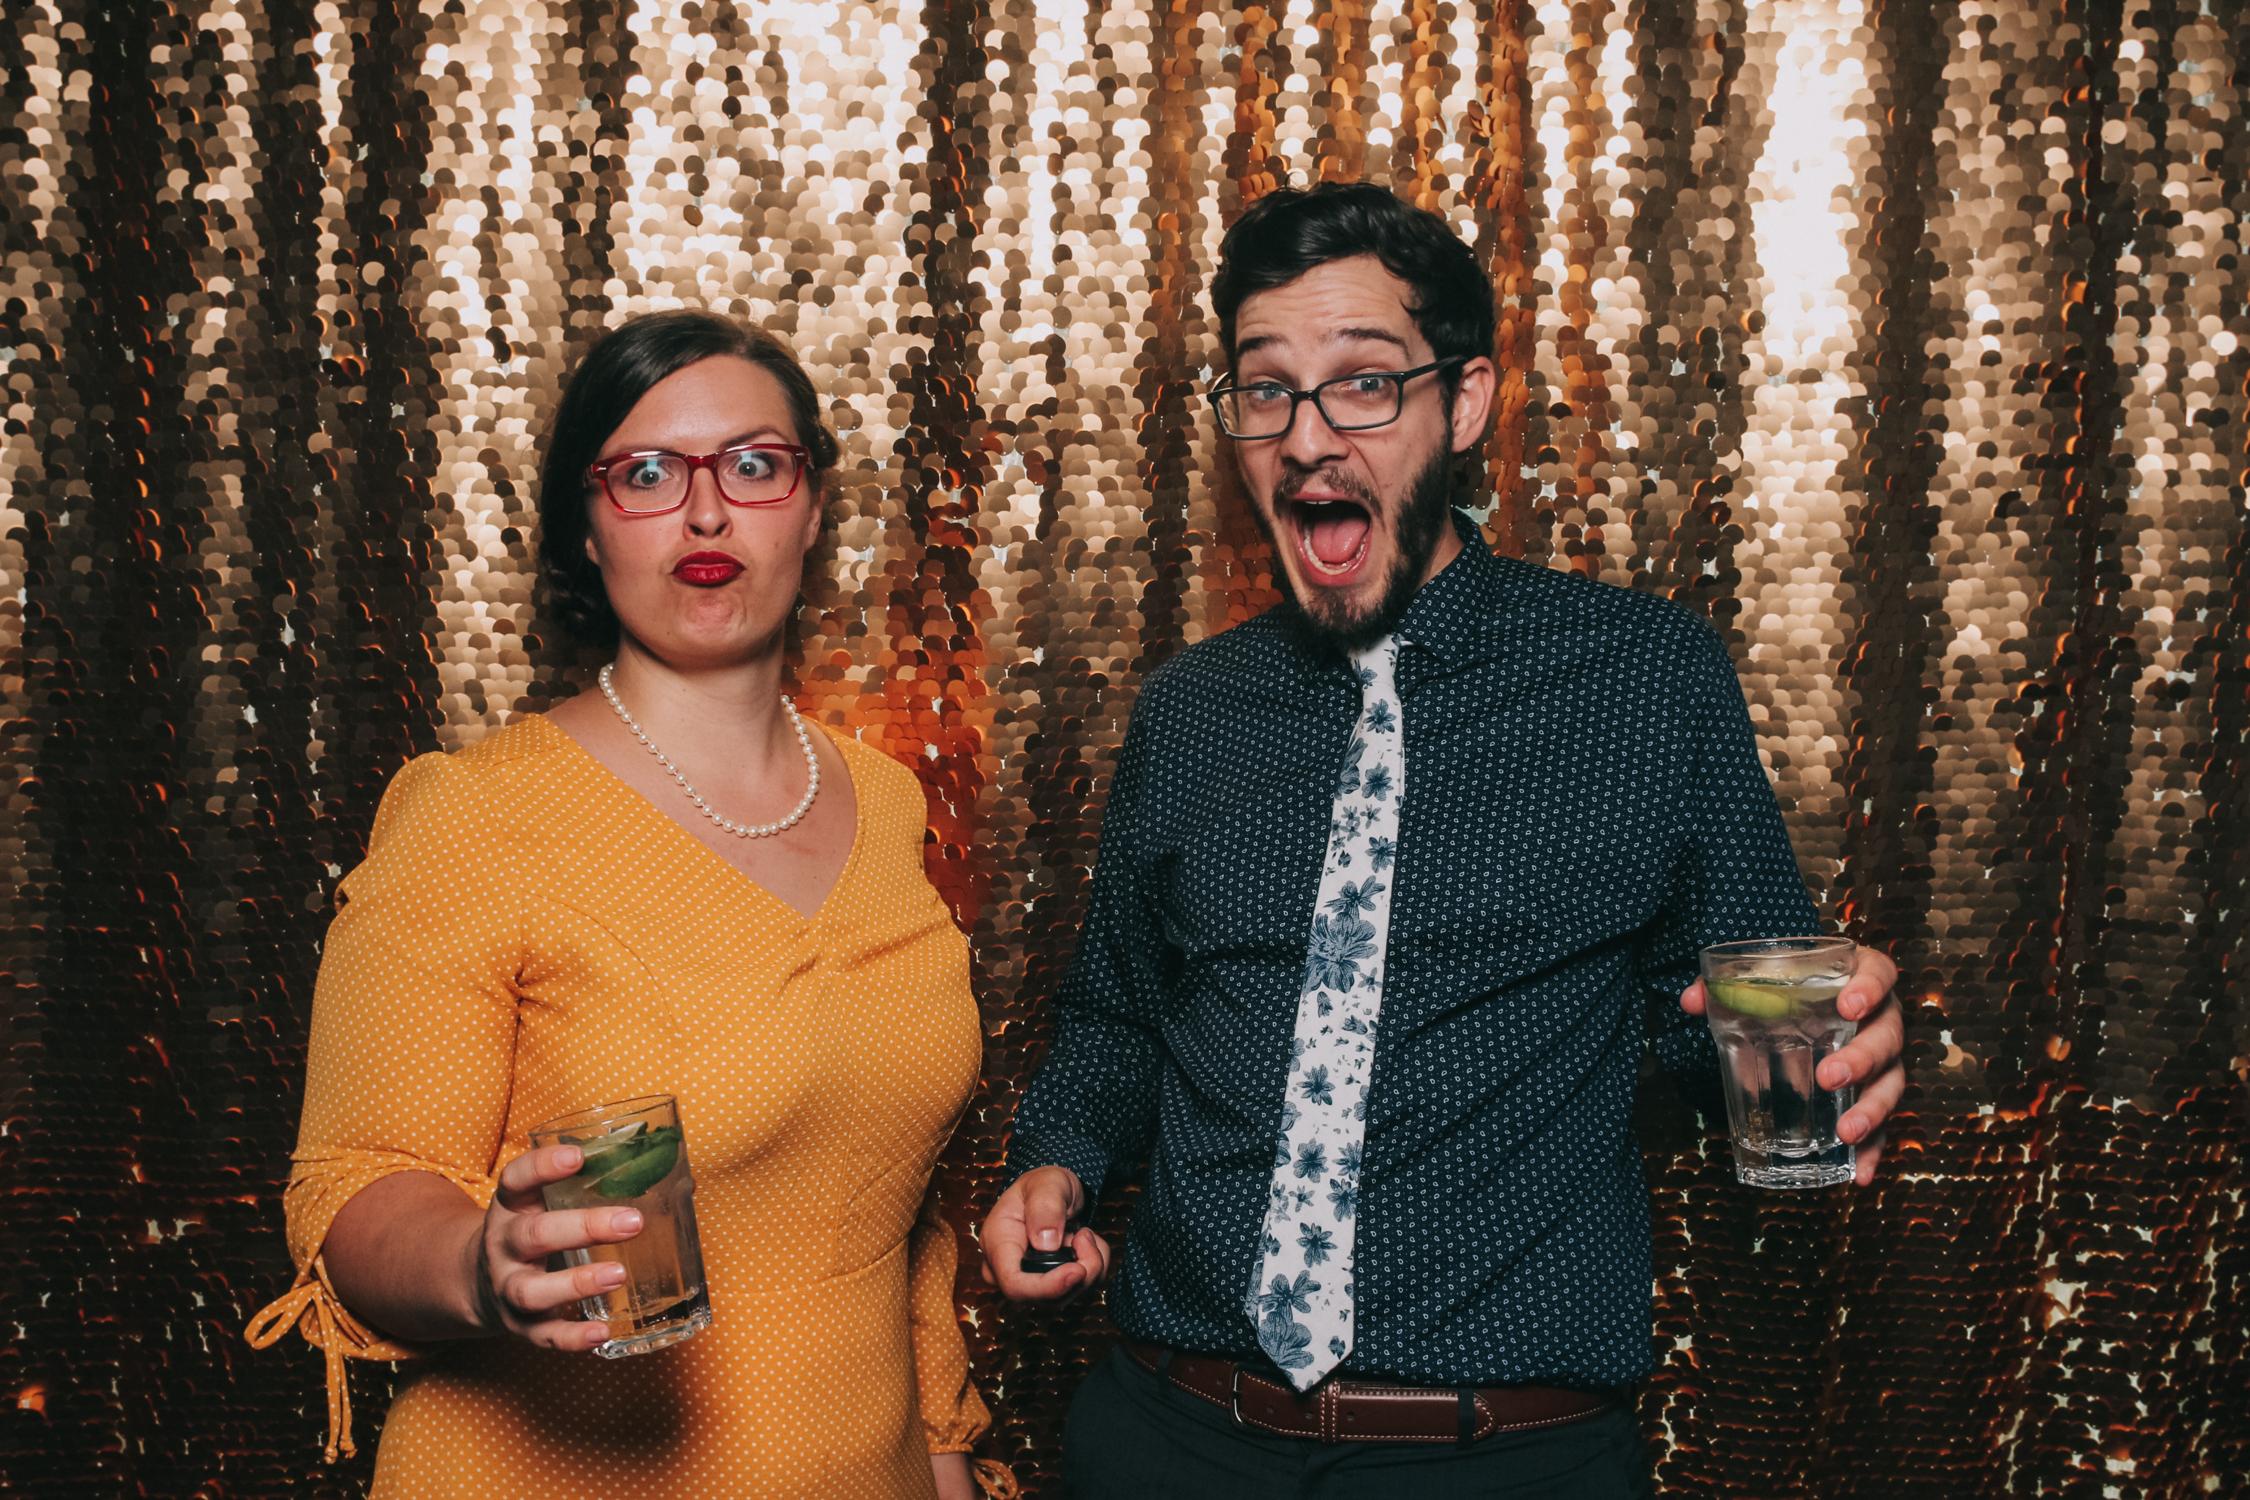 baltimore rusty scupper wedding photo booth-7.jpg